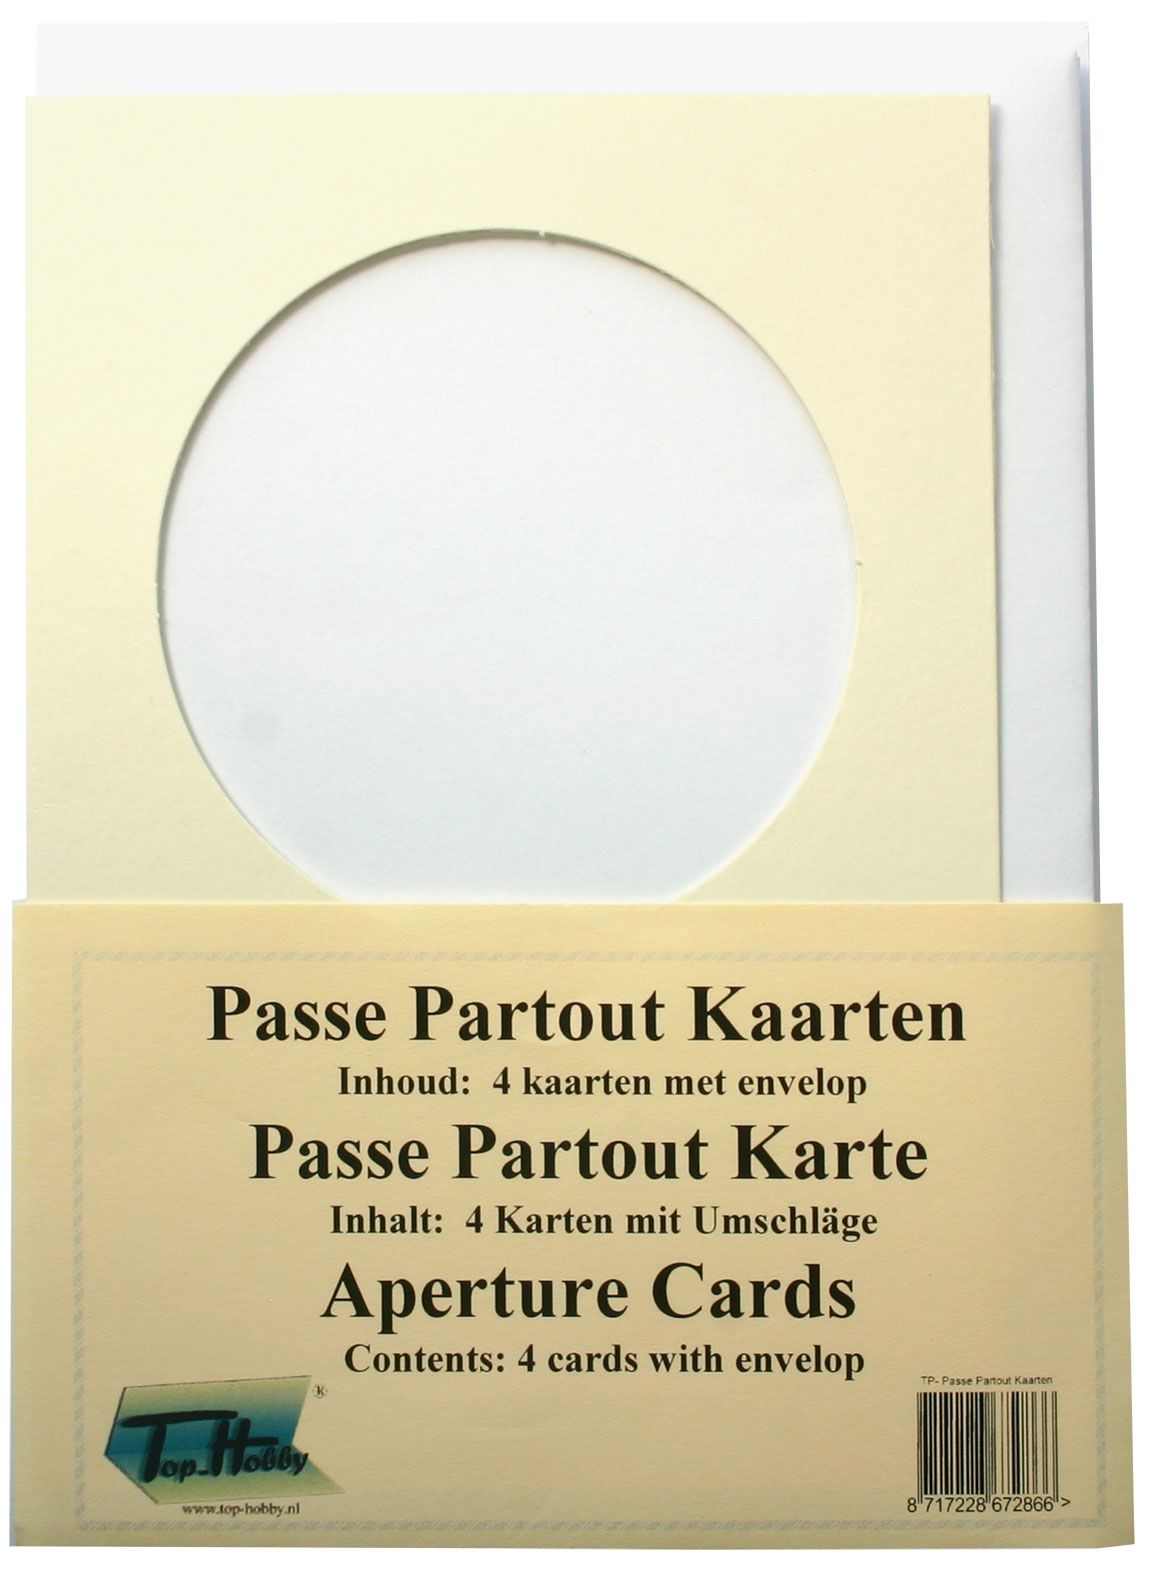 Passe Partout Kaarten.Rond Passe Partout Kaarten Pakje Ivoor